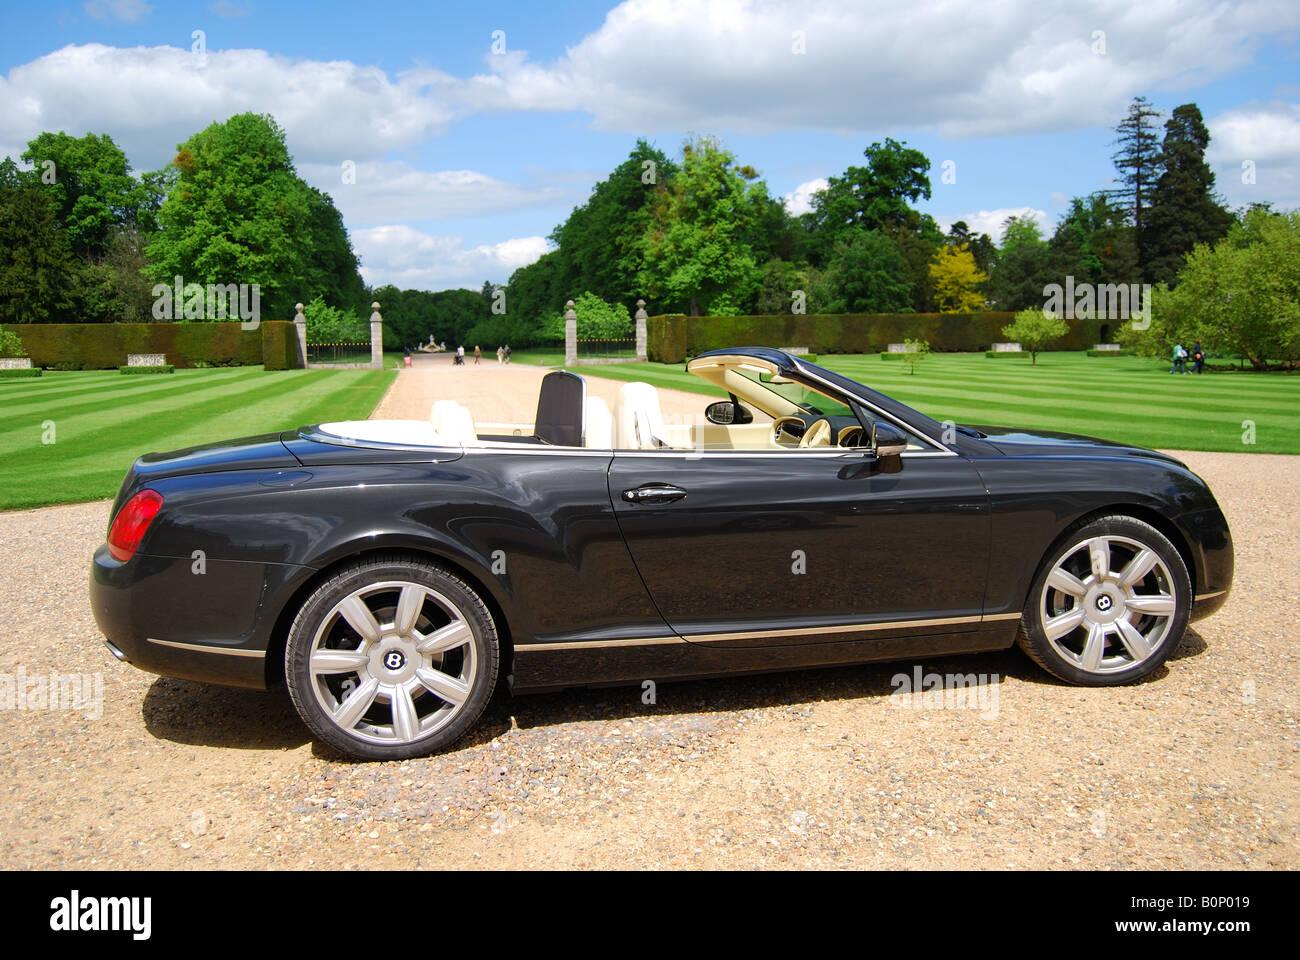 Bentley Azure convertible, Cliveden, Buckinghamshire, England, United Kingdom - Stock Image